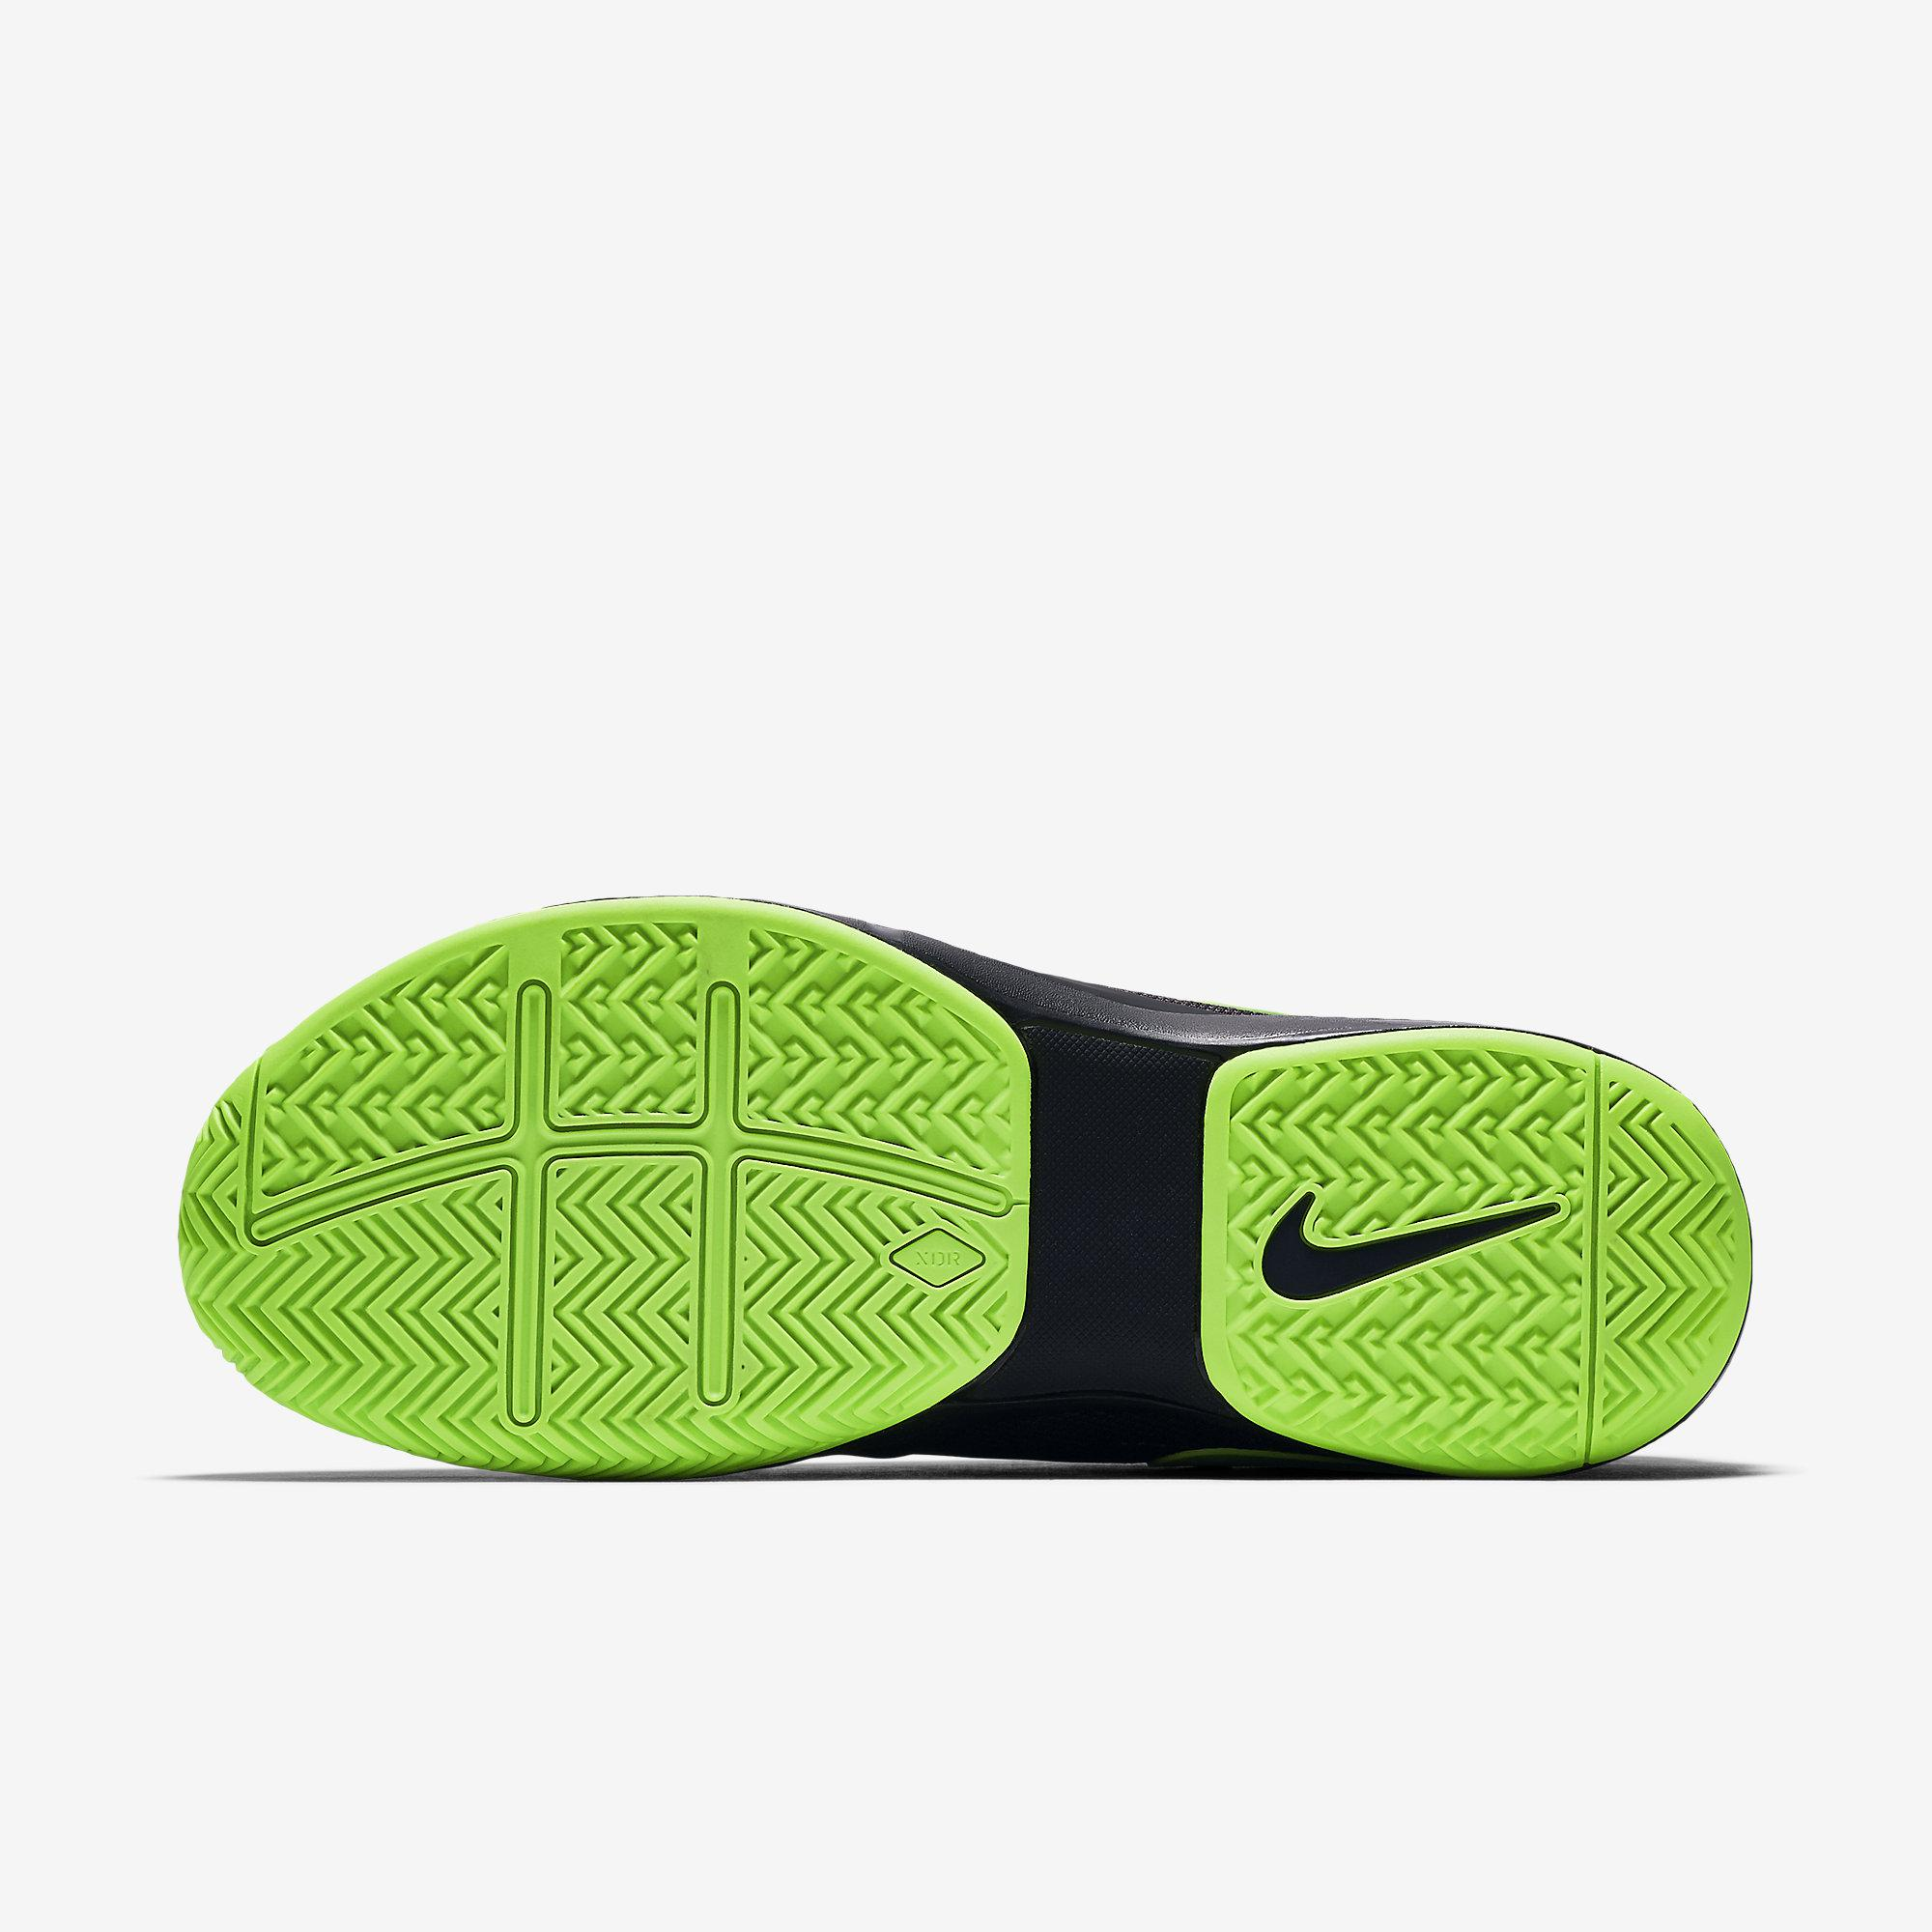 Out Of Stock. Nike Mens Zoom Vapor 9.5 Tour QS Tennis Shoes - Black/ ...